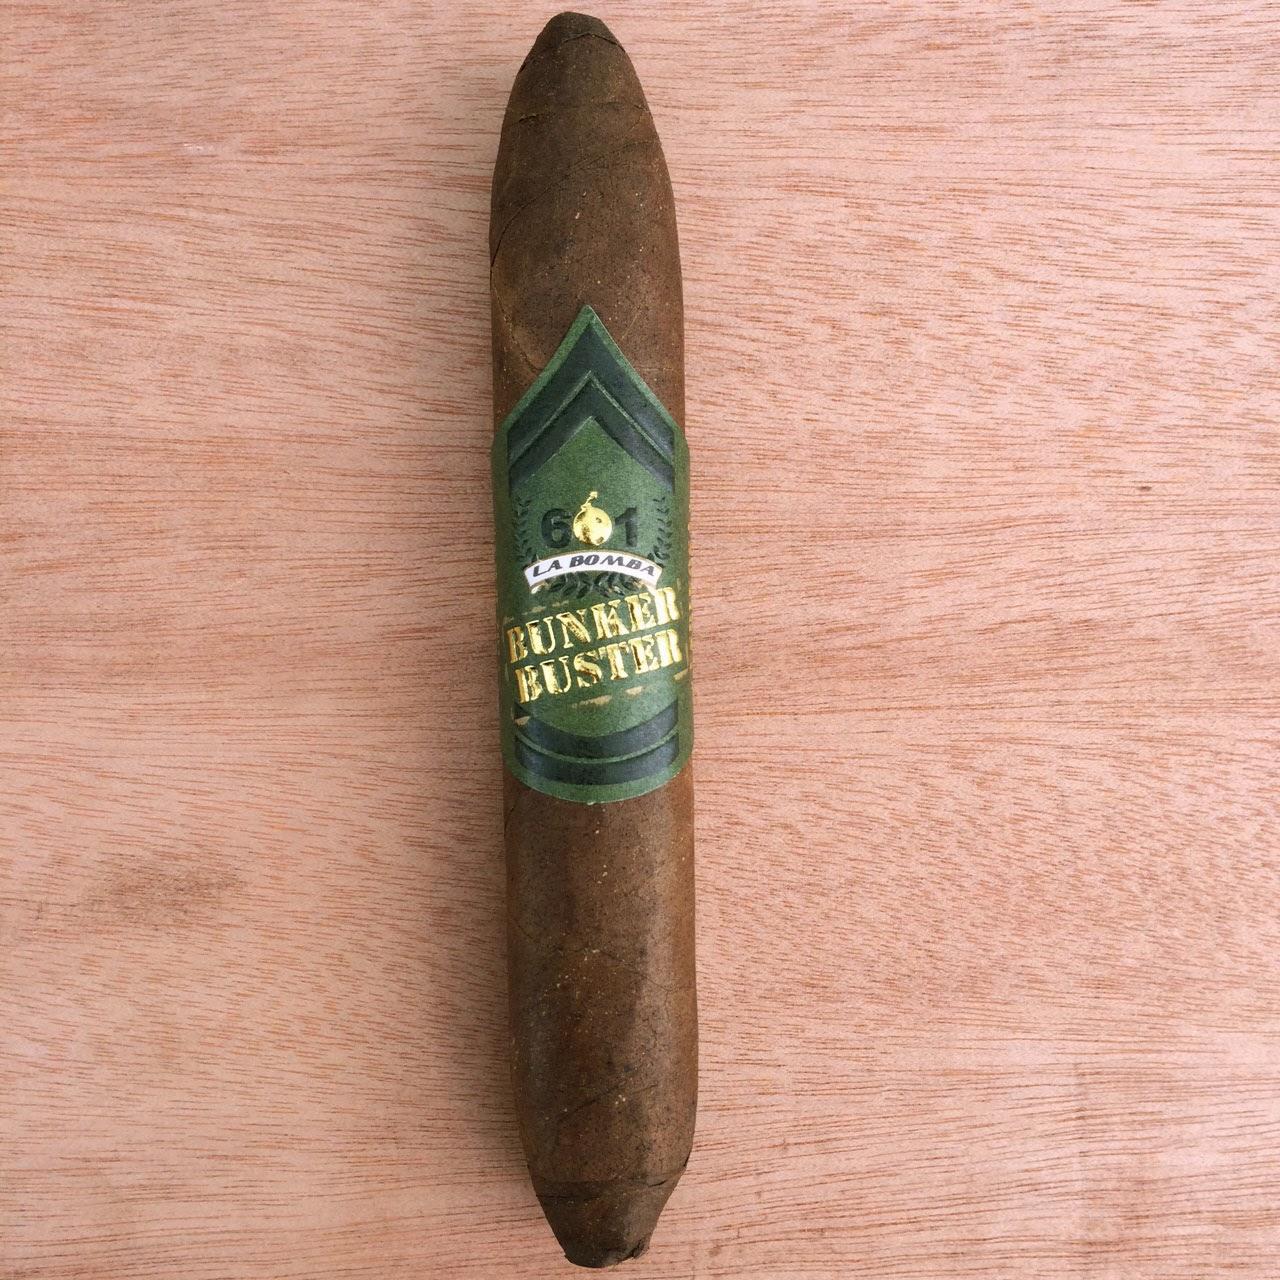 Cigar News: Espinosa Cigars and Smoke Inn Showcase 601 La Bomba Bunker Buster